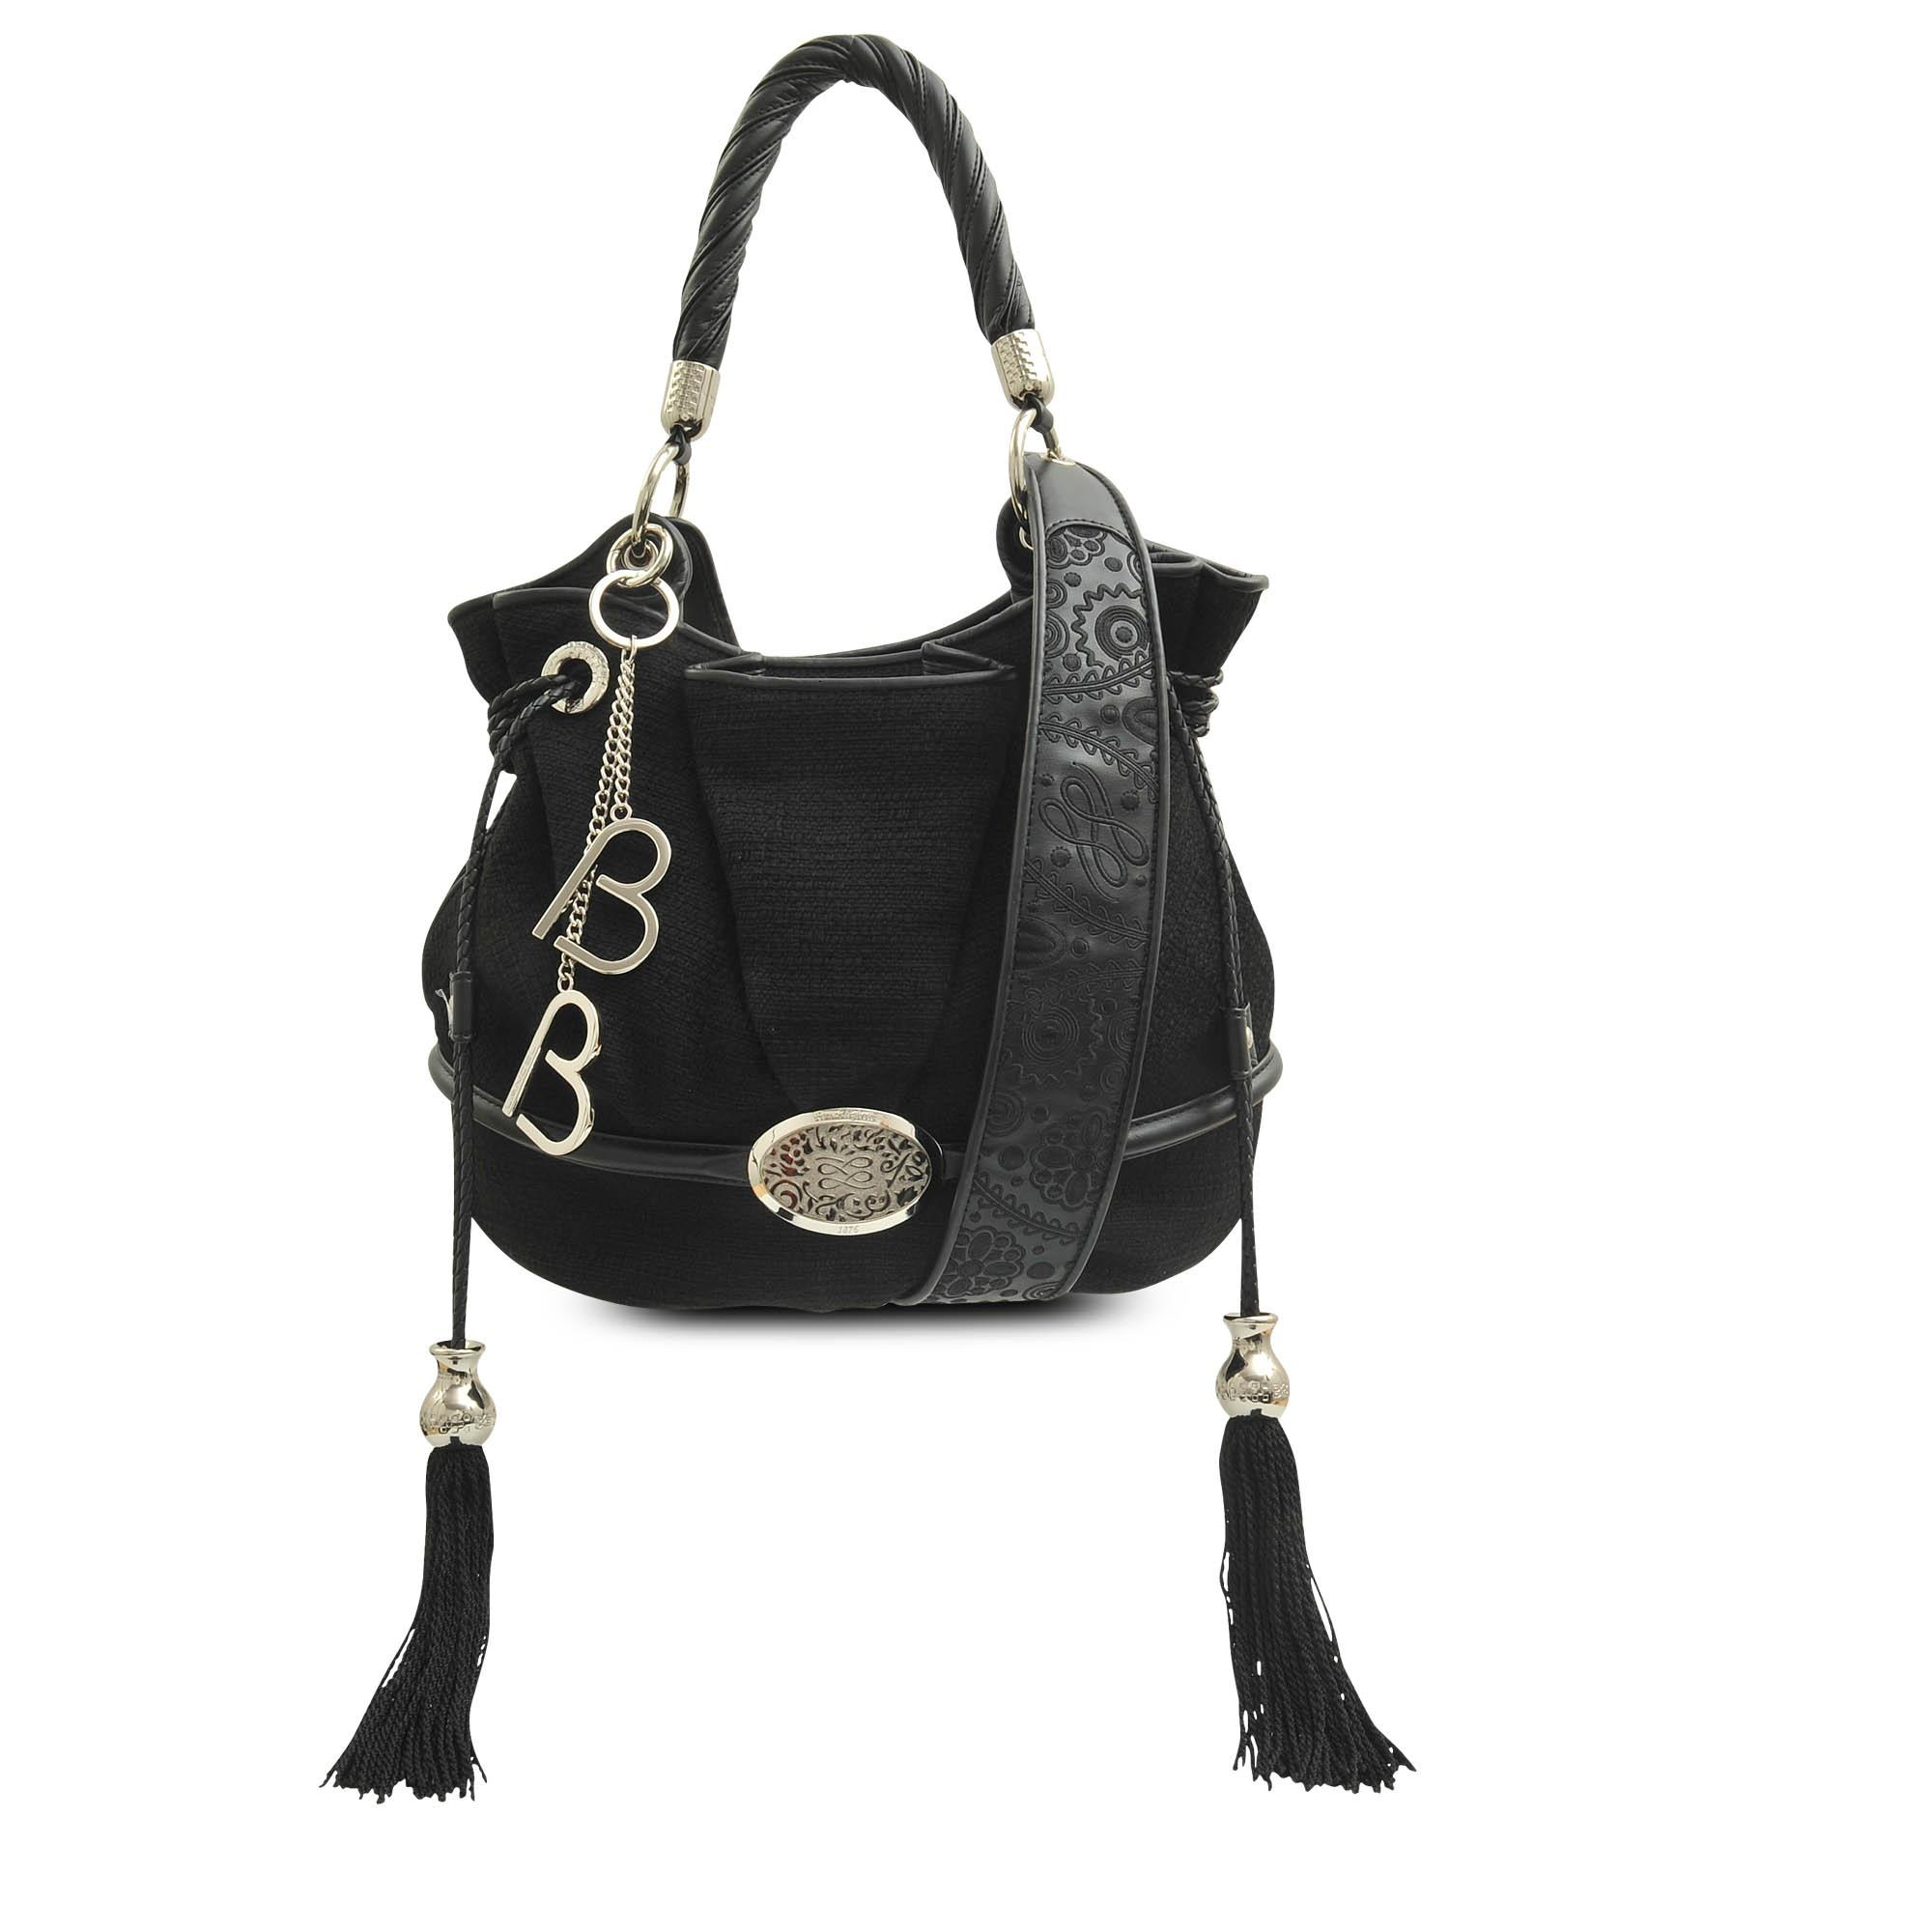 Lancel Brigitte Bardot Bucket Bag in Black